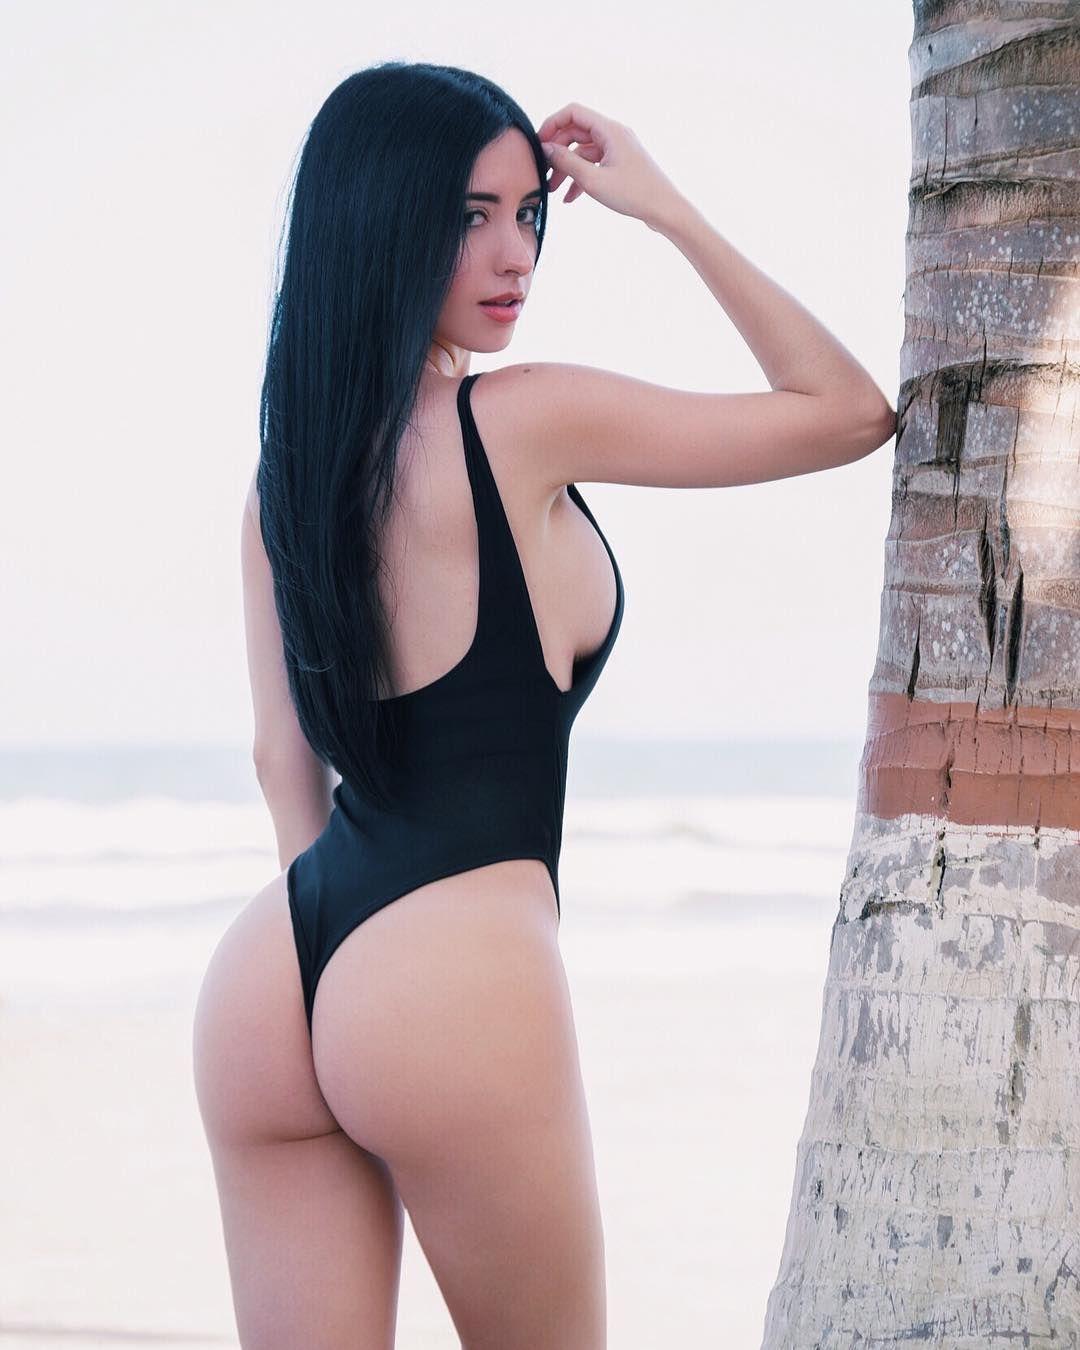 panties Celebrity Maria Fernanda Padilla naked photo 2017